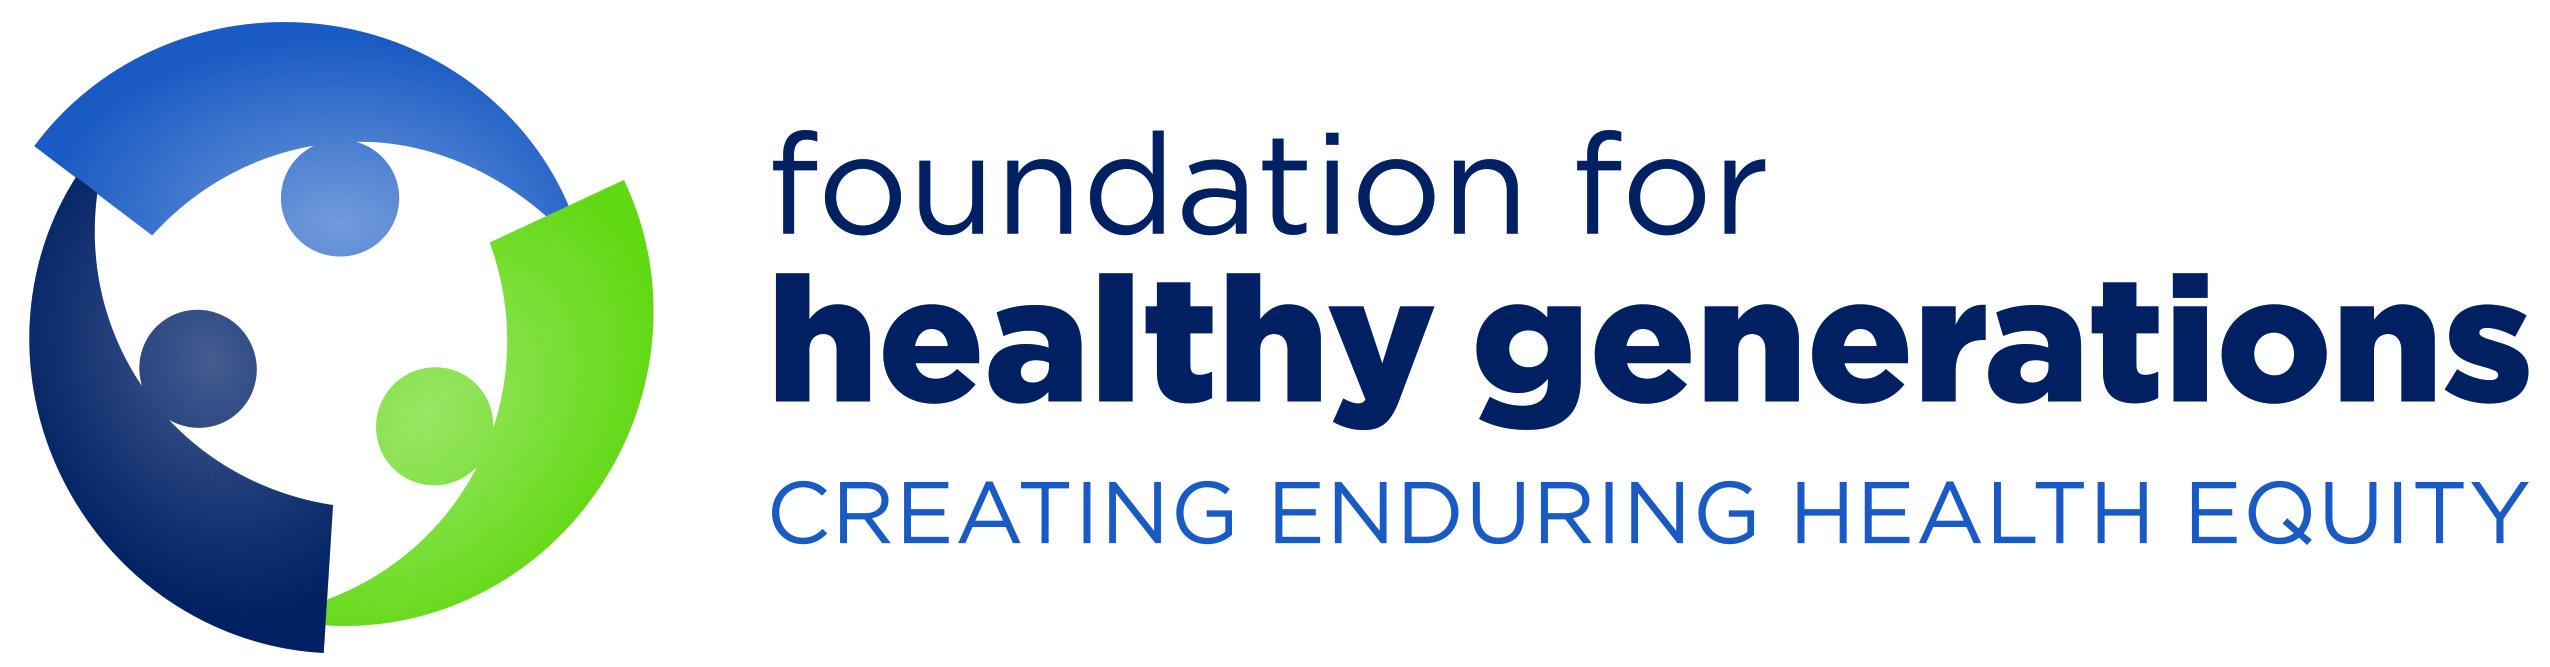 FHG_Logo_4C_Horizontal_Gradient_TaglineBlue